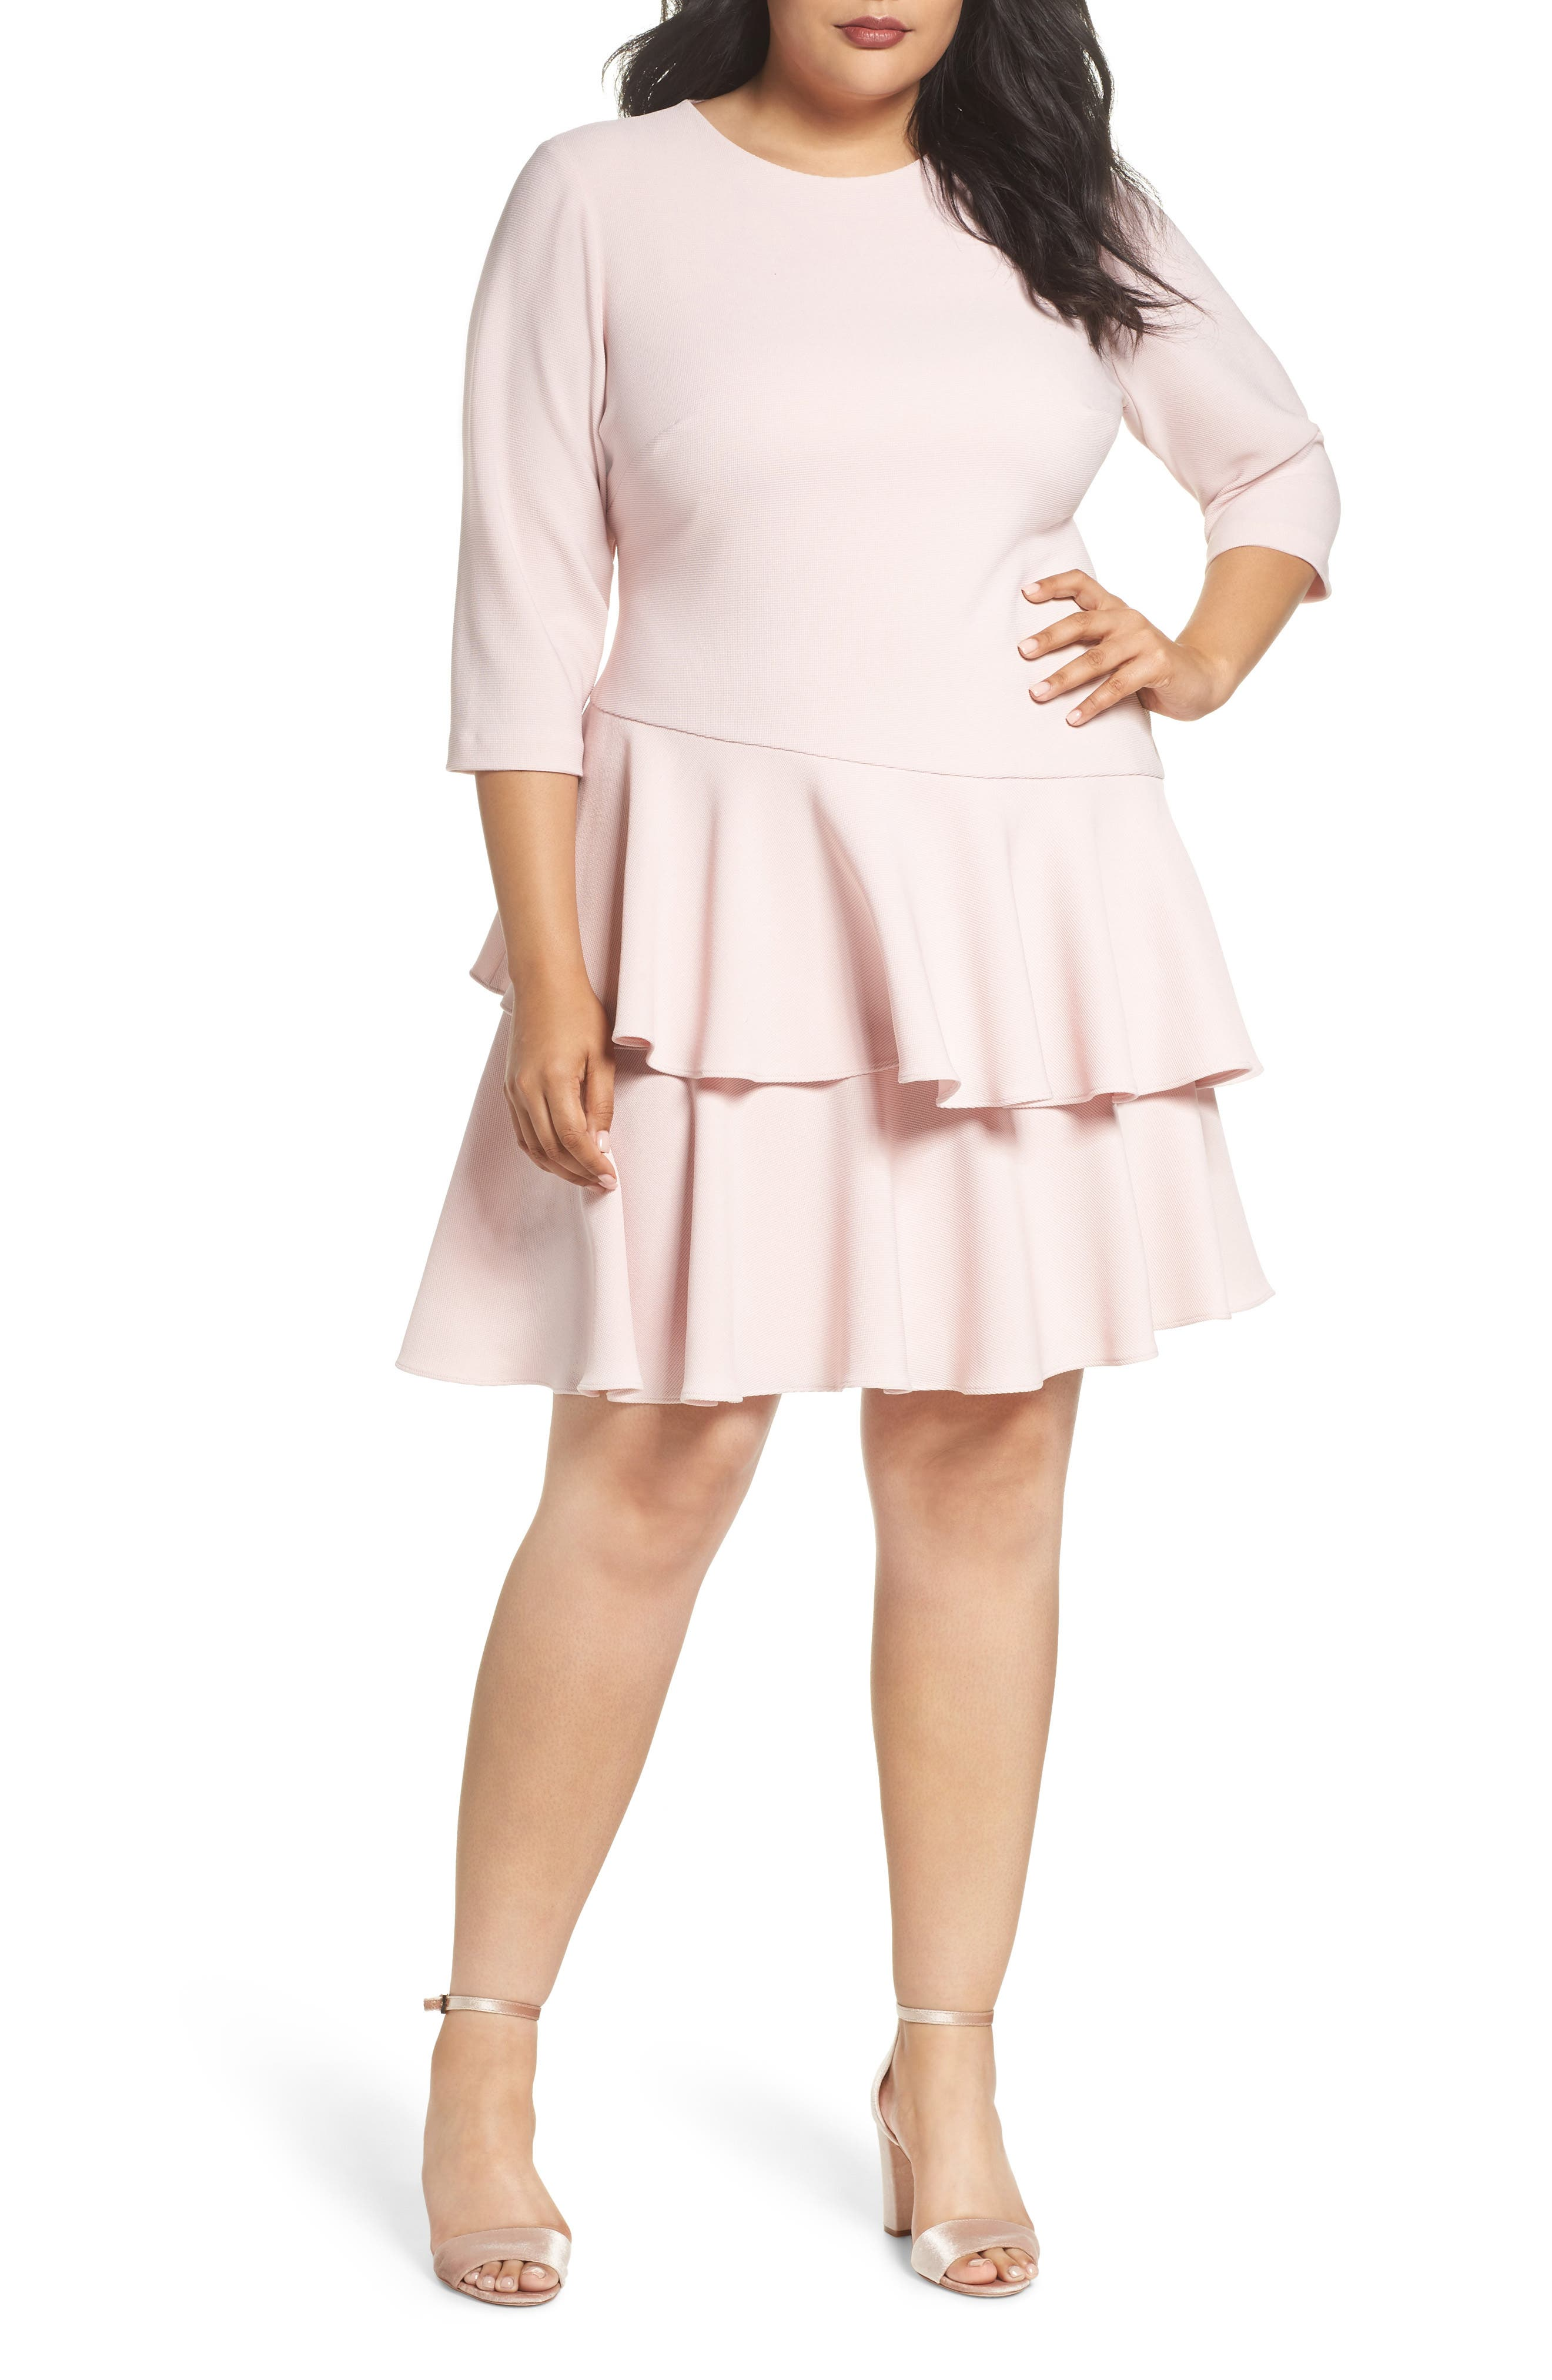 Alternate Image 1 Selected - Eliza J Tiered Ruffle A-Line Dress (Plus Size)